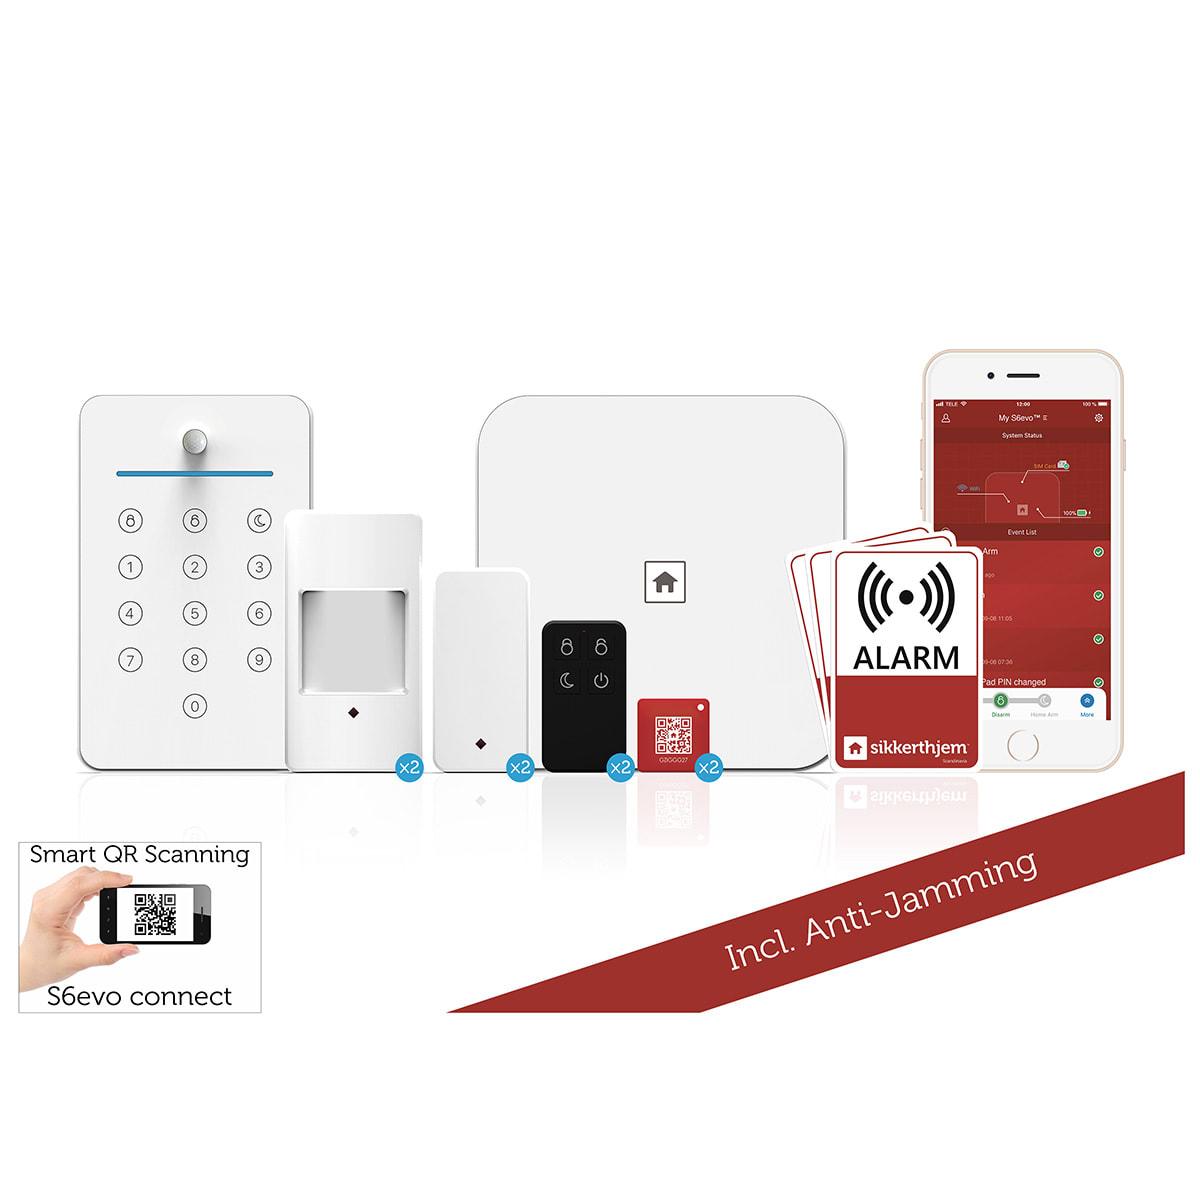 Villapakken - Inkl. alarm, sensorer, nøglebrikker, fjernbetjening m.m.